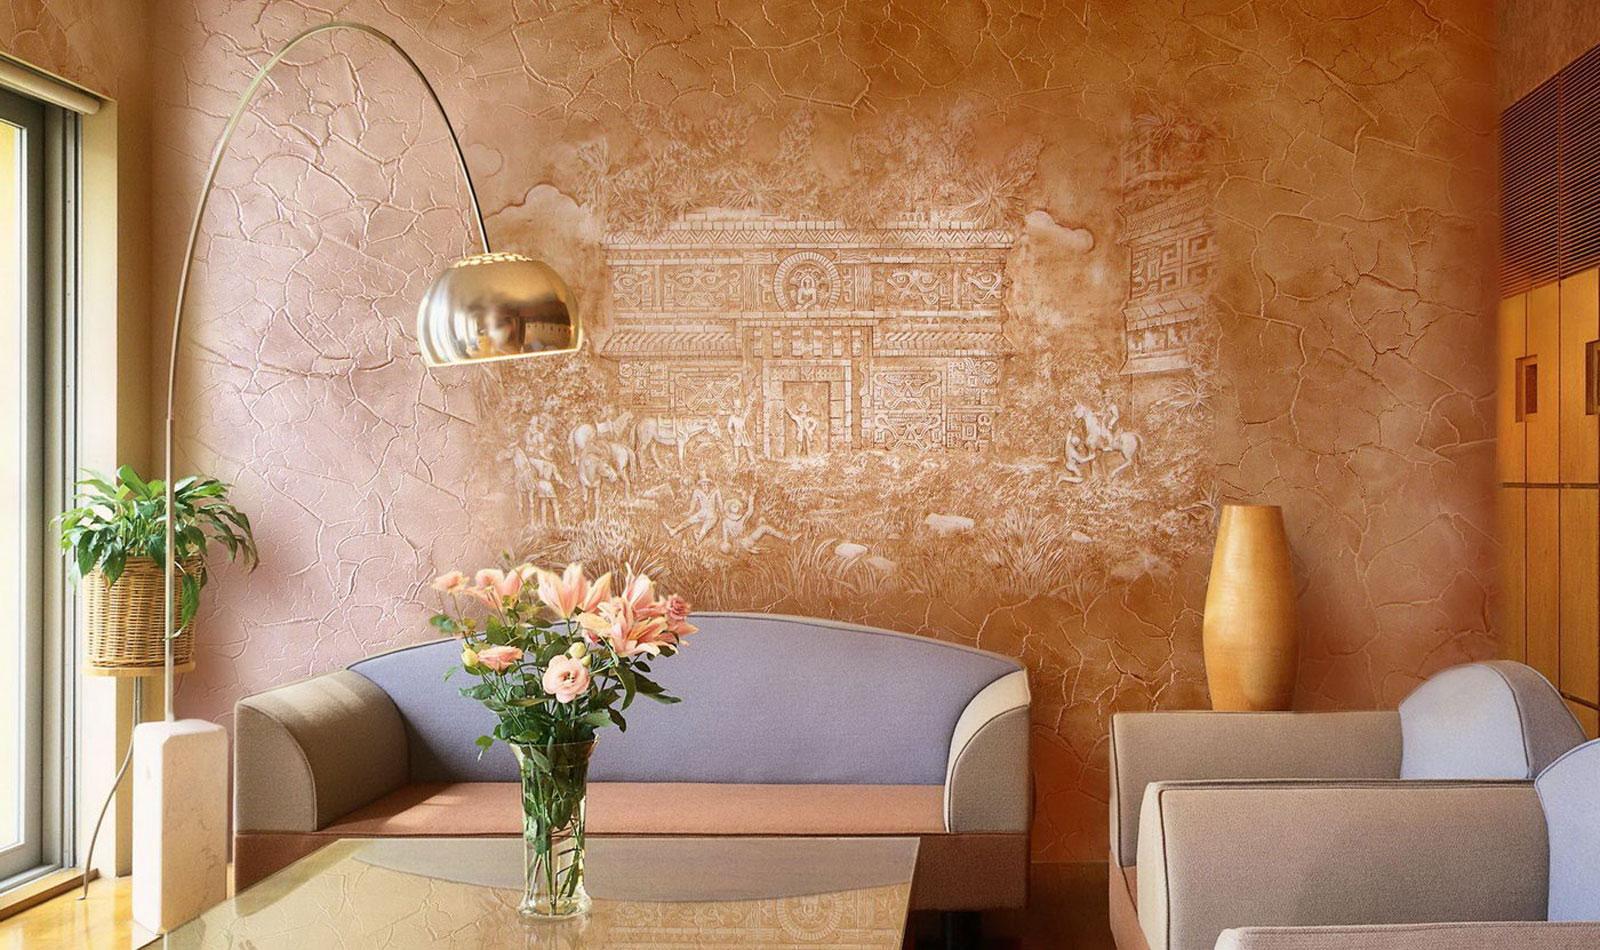 Картина на стене из декоративной штукатурки